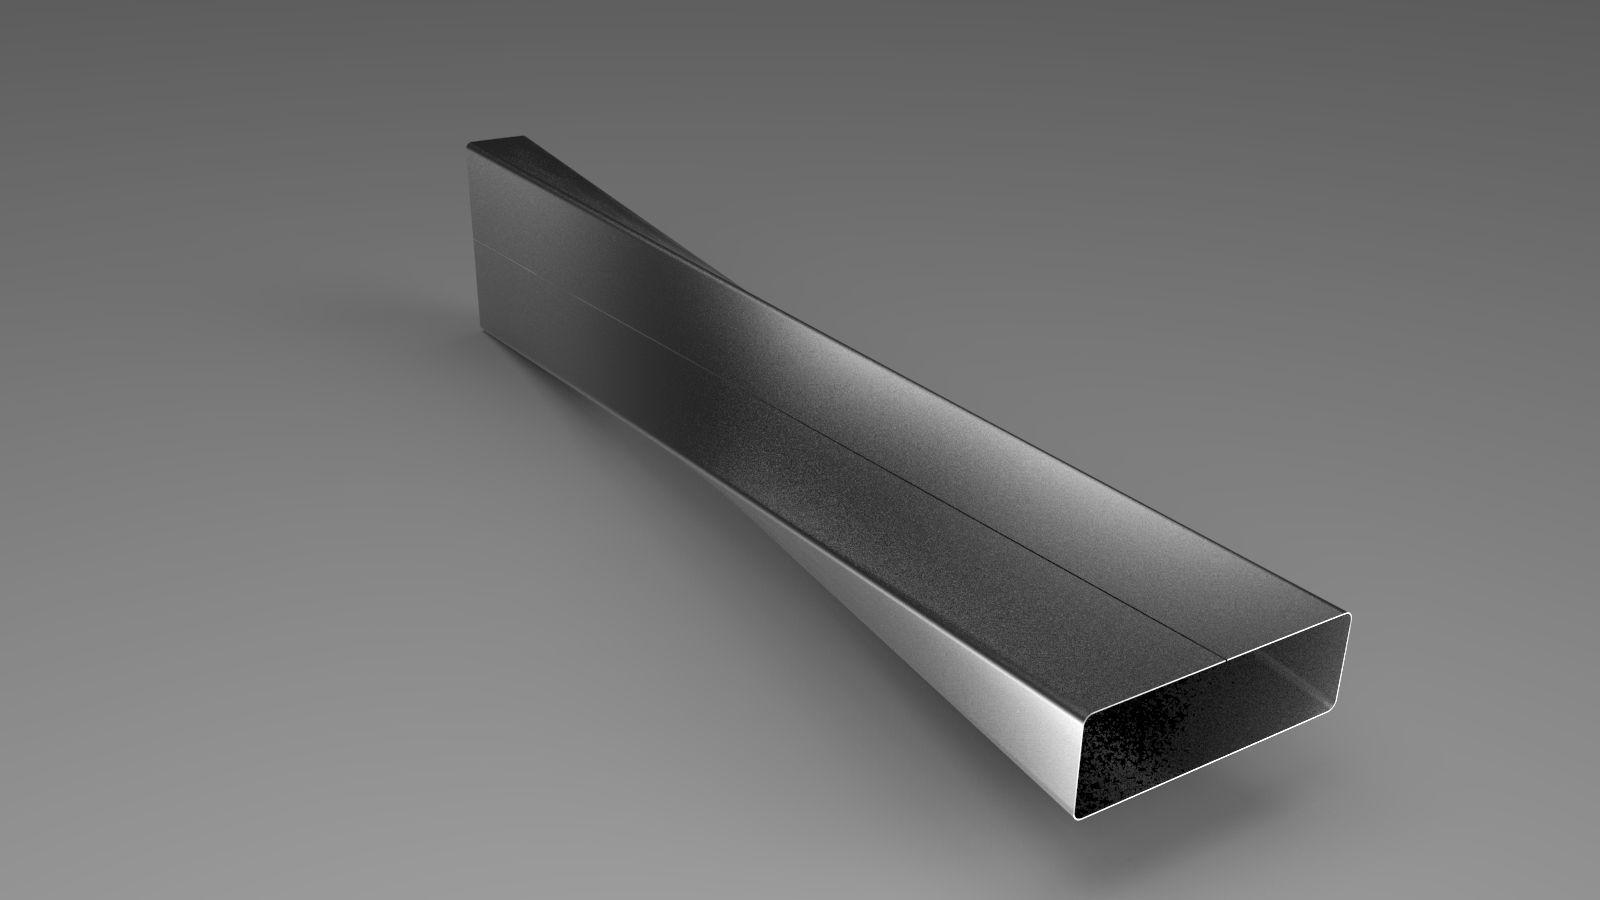 Twist Ducting Sheet Metal Free 3d Model Sldprt Sldasm